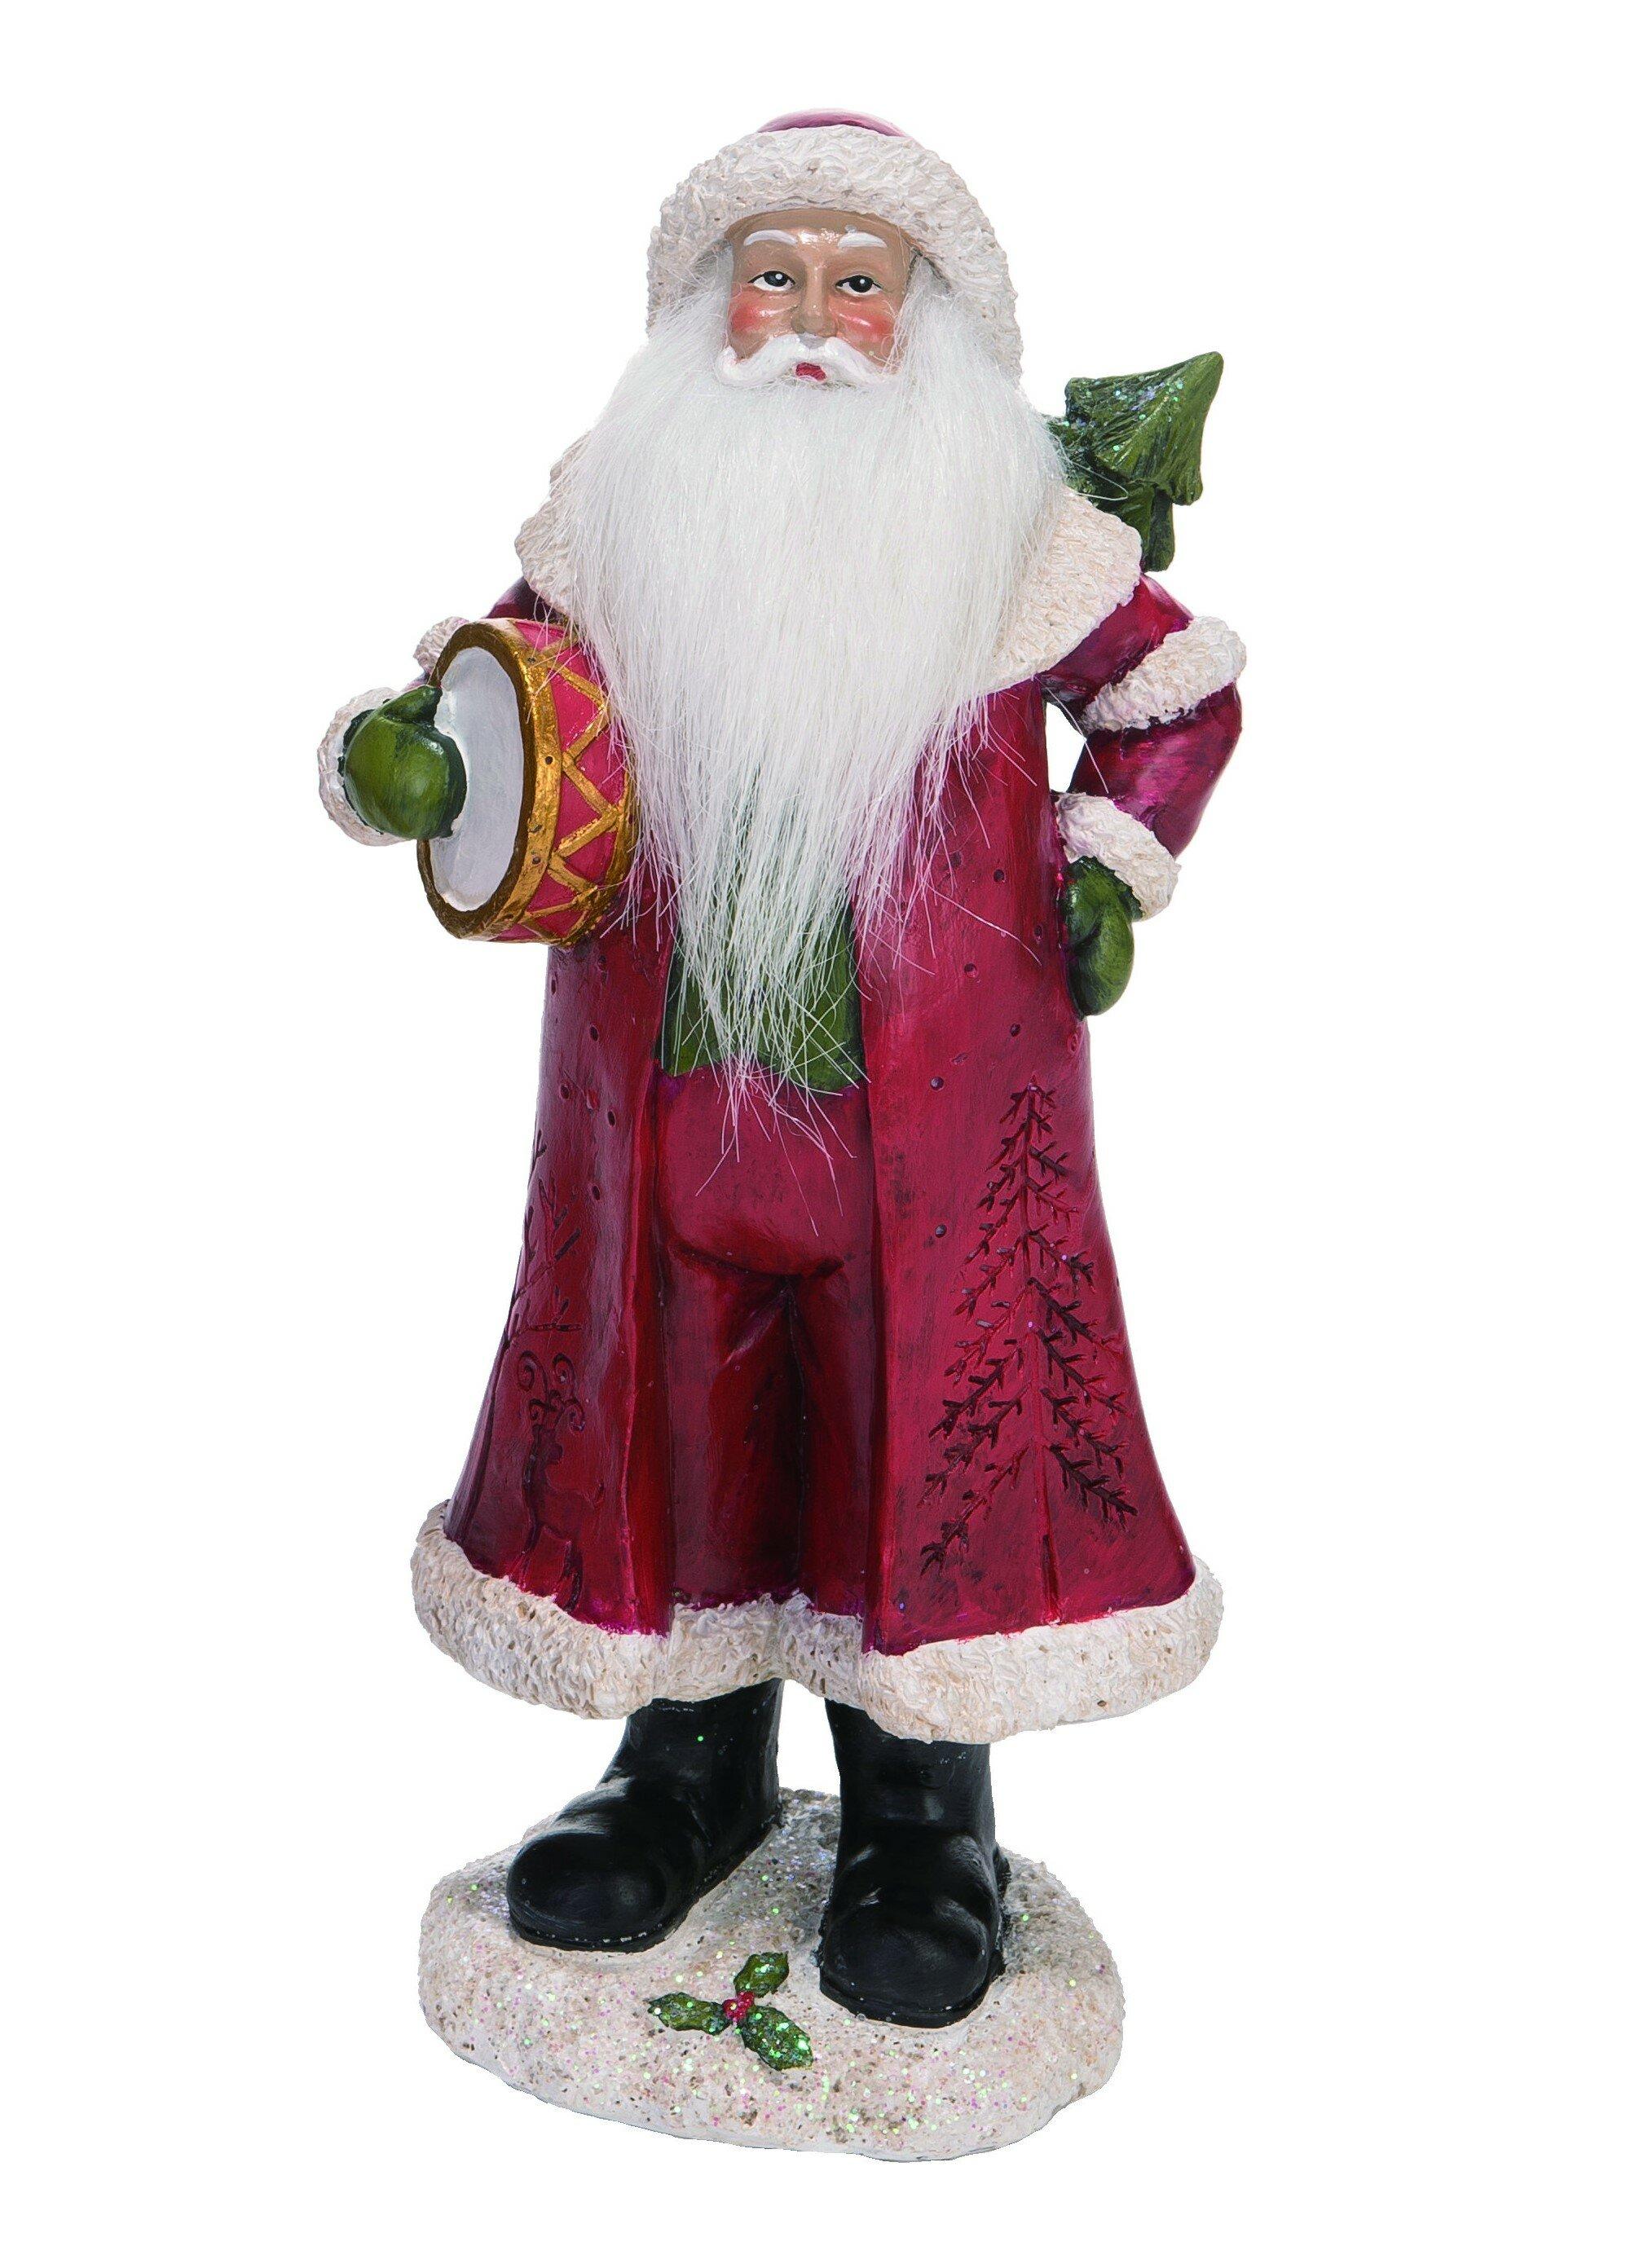 The Holiday Aisle Resin Medium Soft Beard Santa Figurine Wayfair